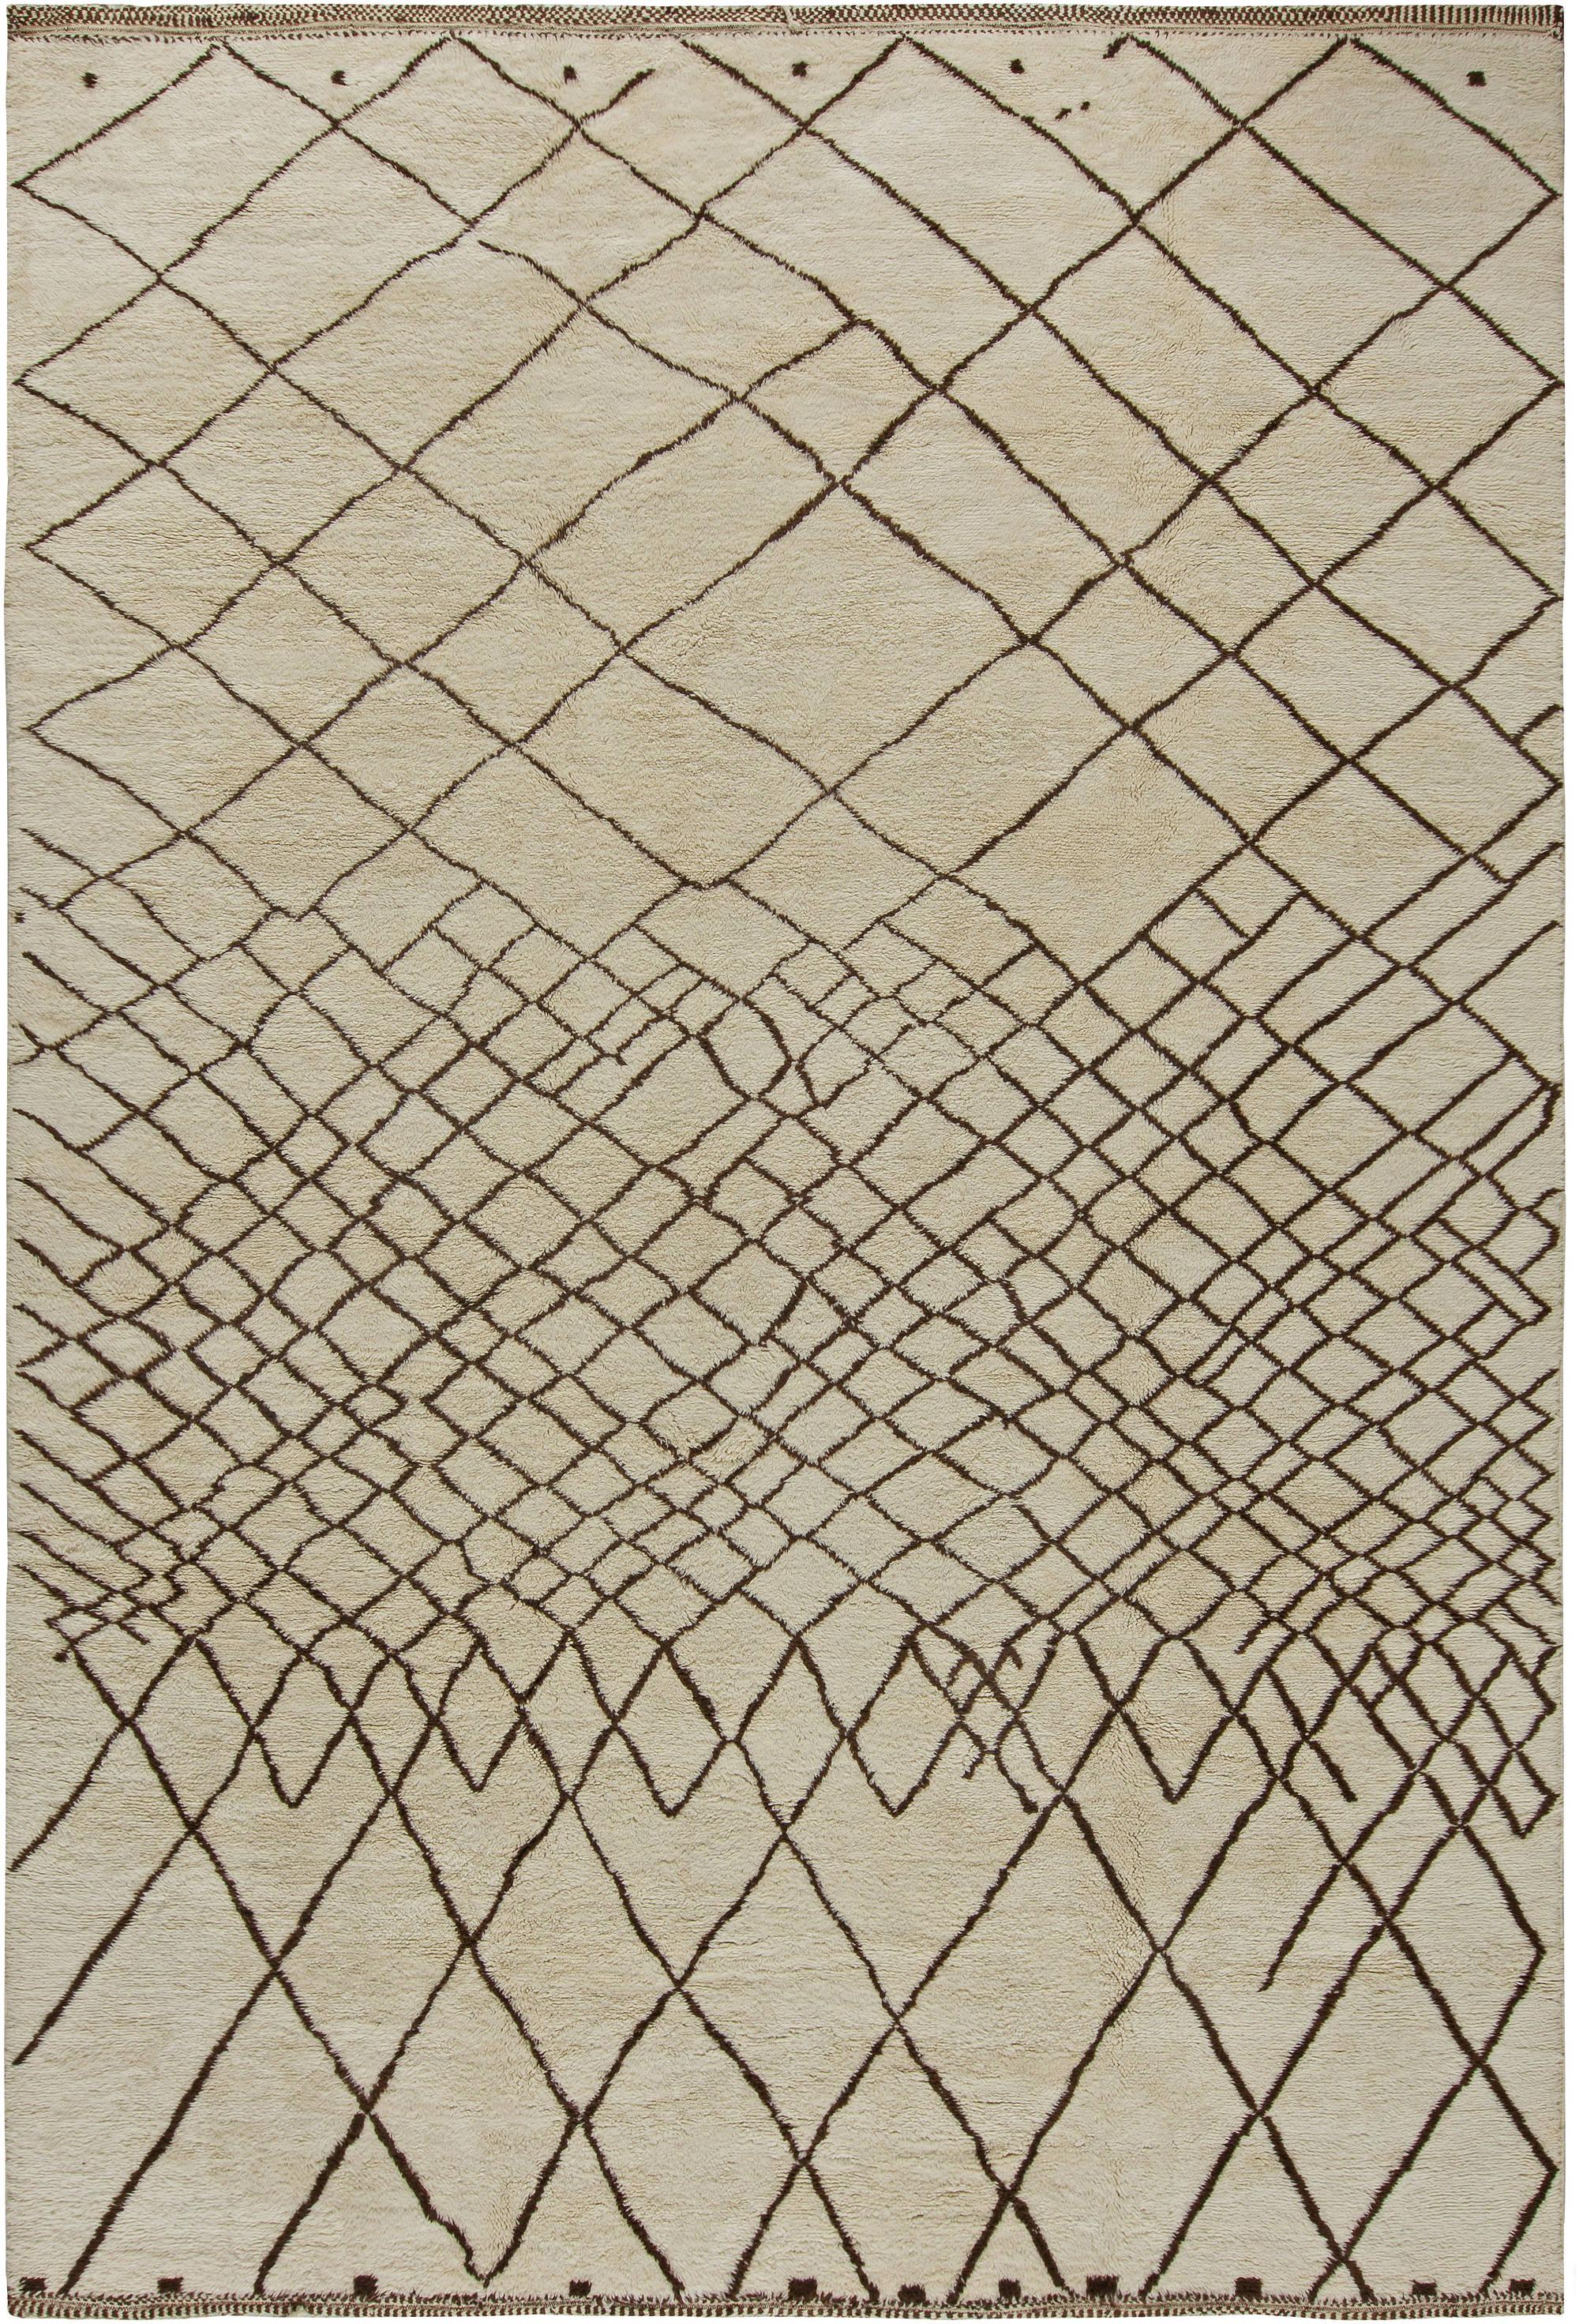 Moroccan Carpet N10914